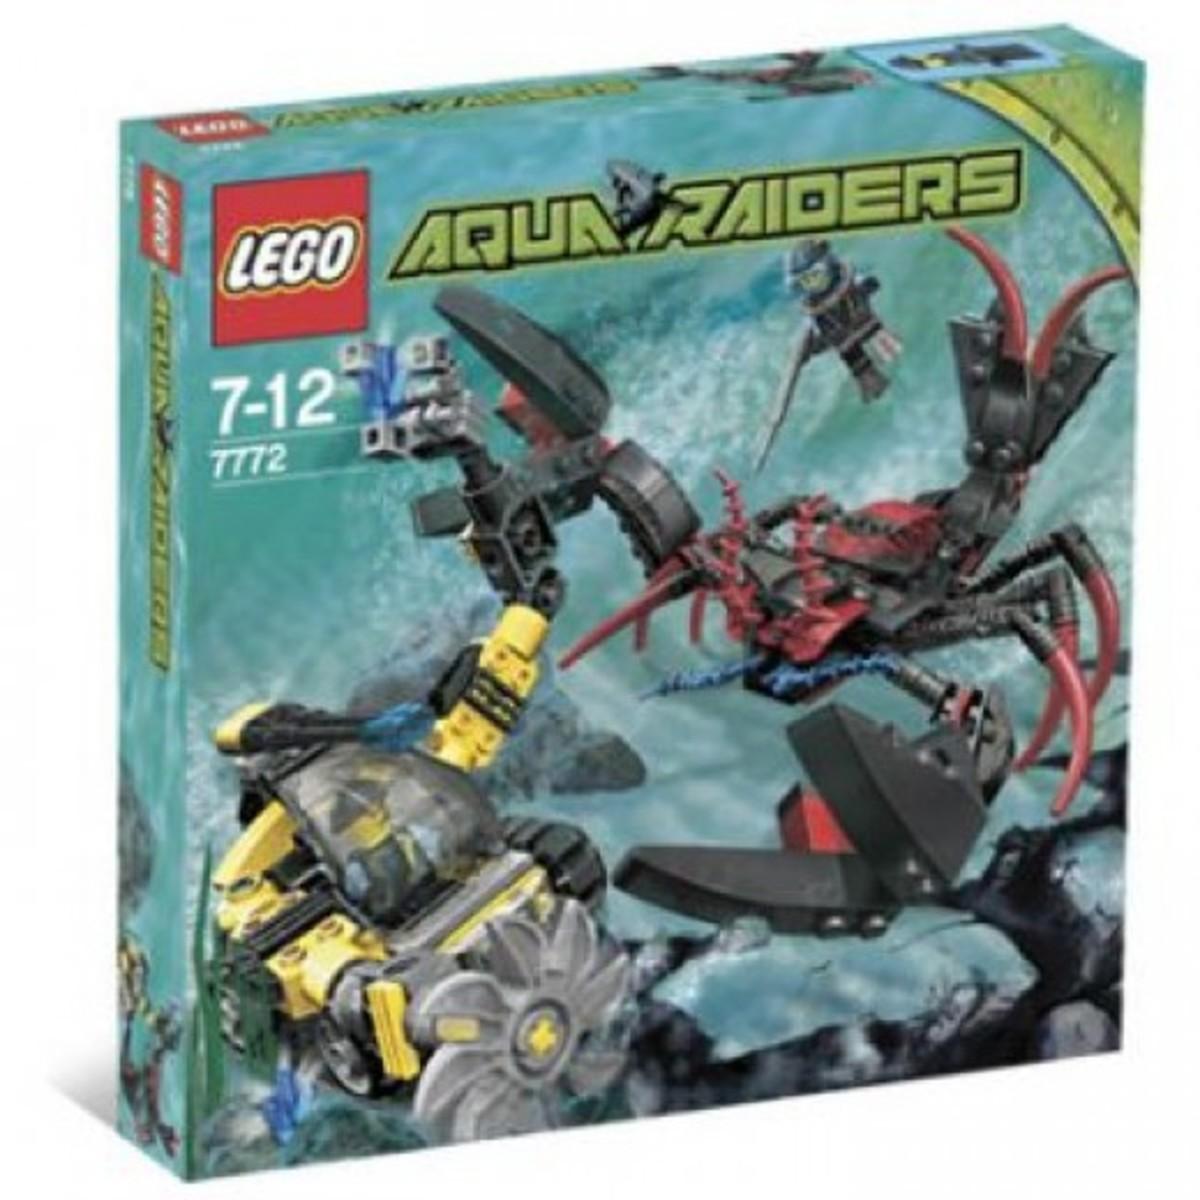 LEGO Aqua Raiders Lobster Strike 7772 Box